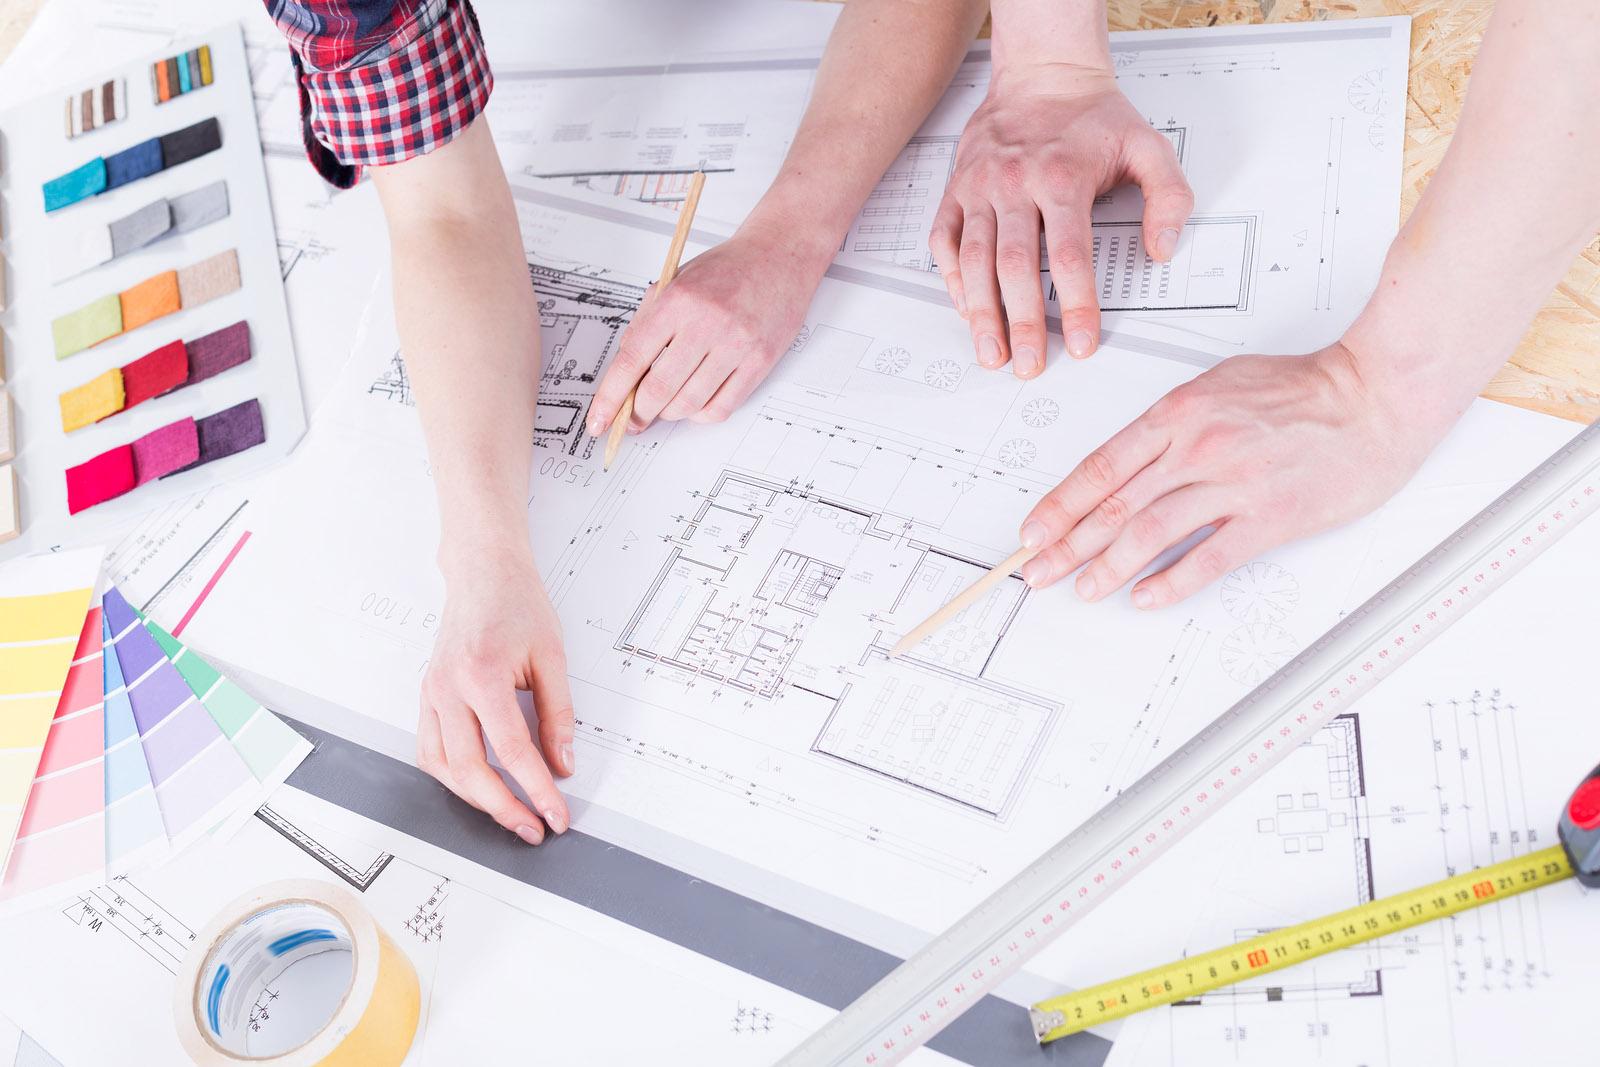 Floor plan designers deciding on final details for new custom home plans